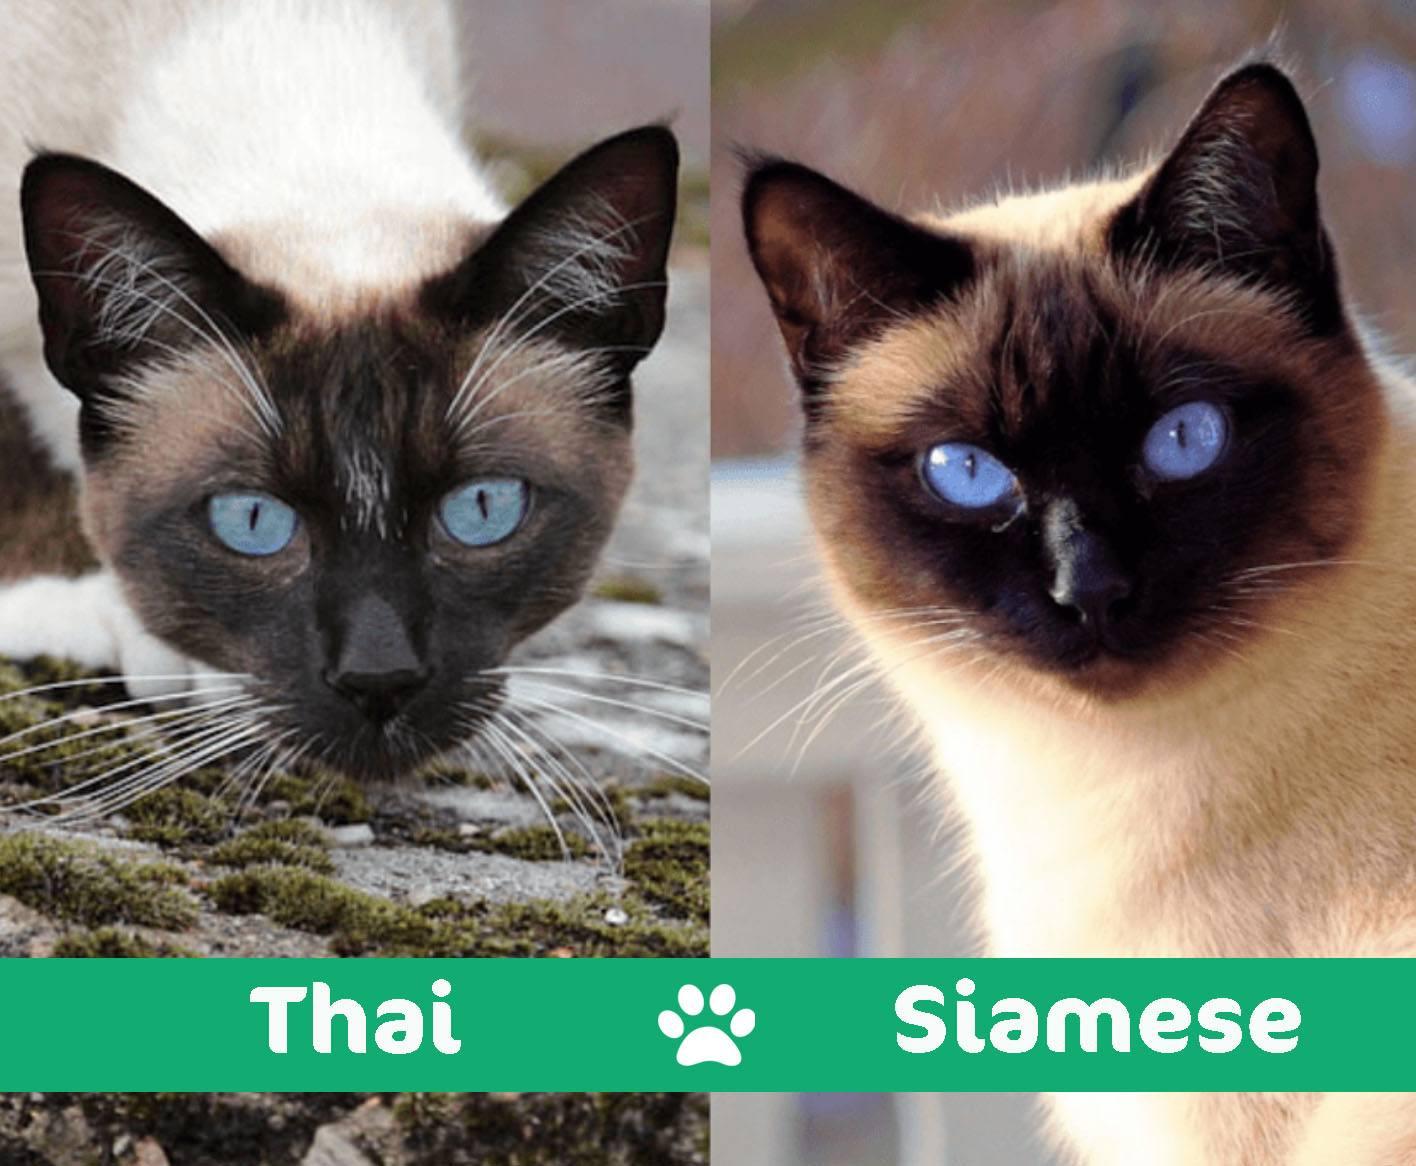 thai vs siamese